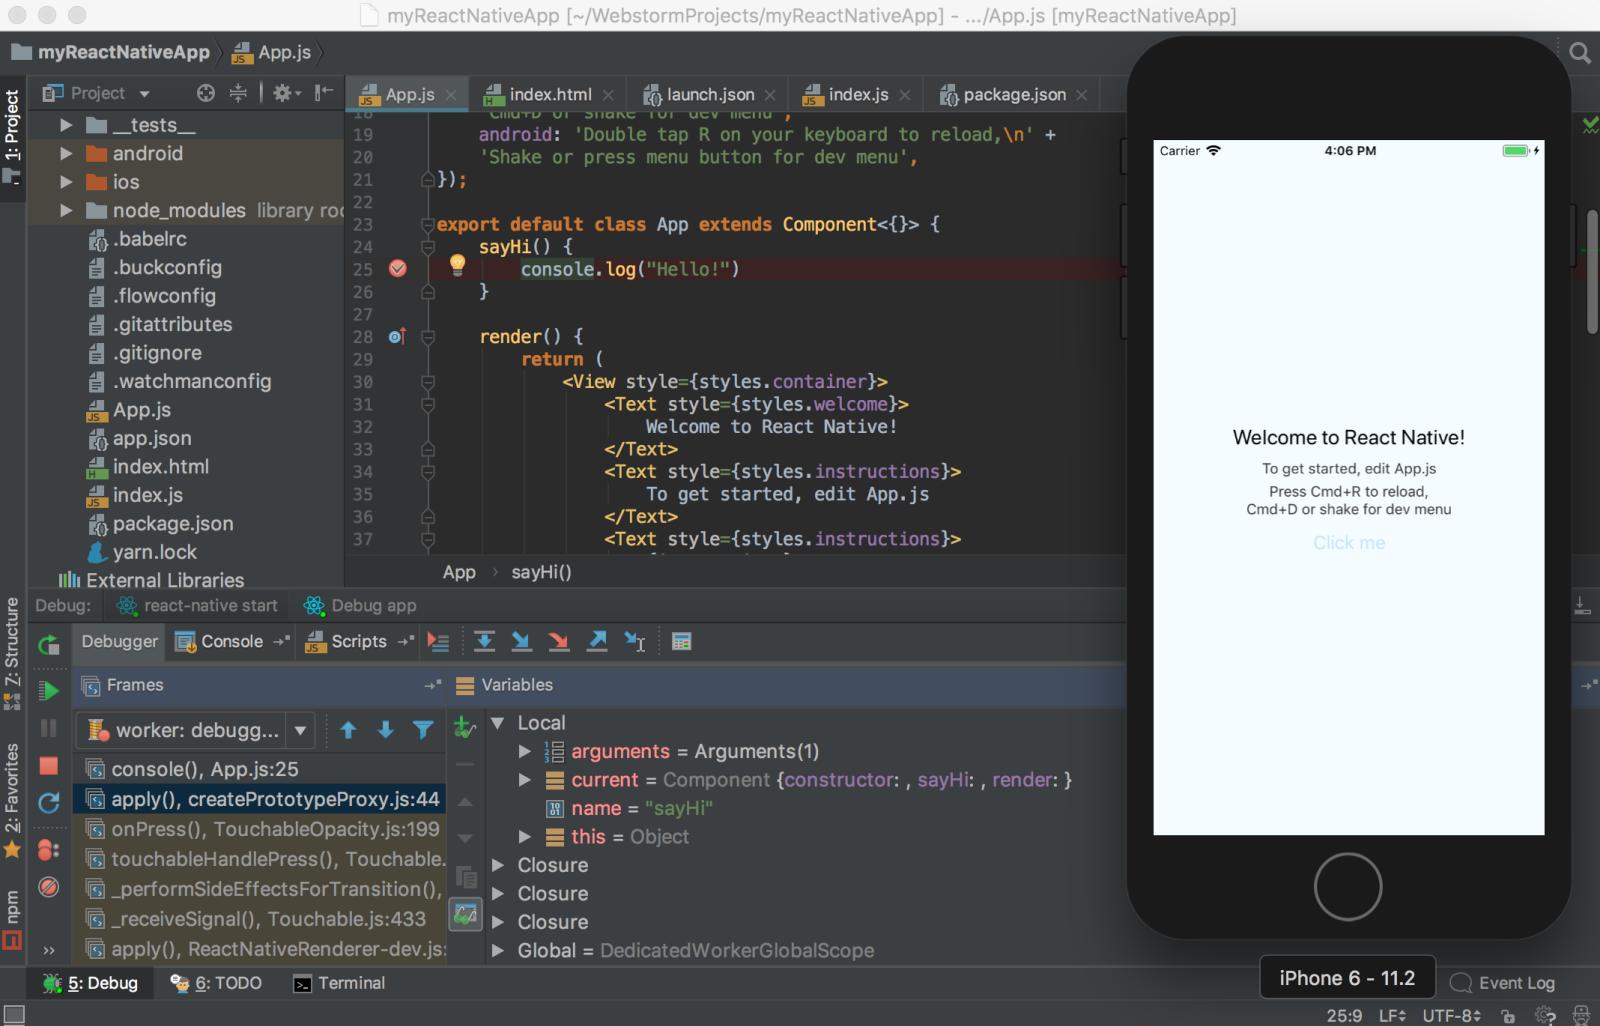 ws_react_native_debug_react_native_app_in_simulator.png